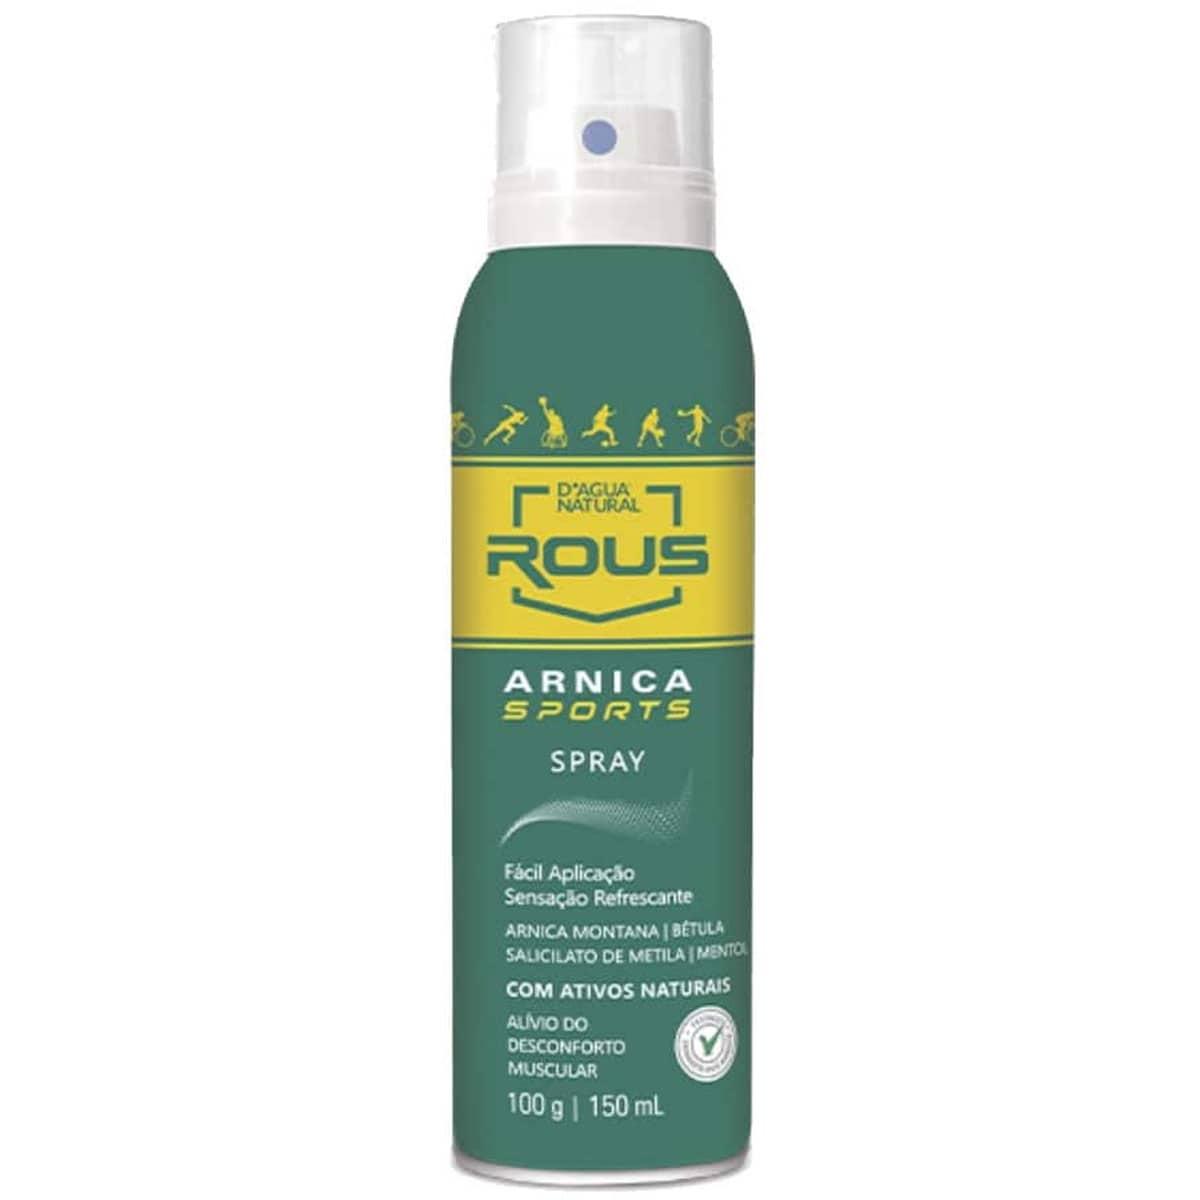 Spray arnica sports 150ml